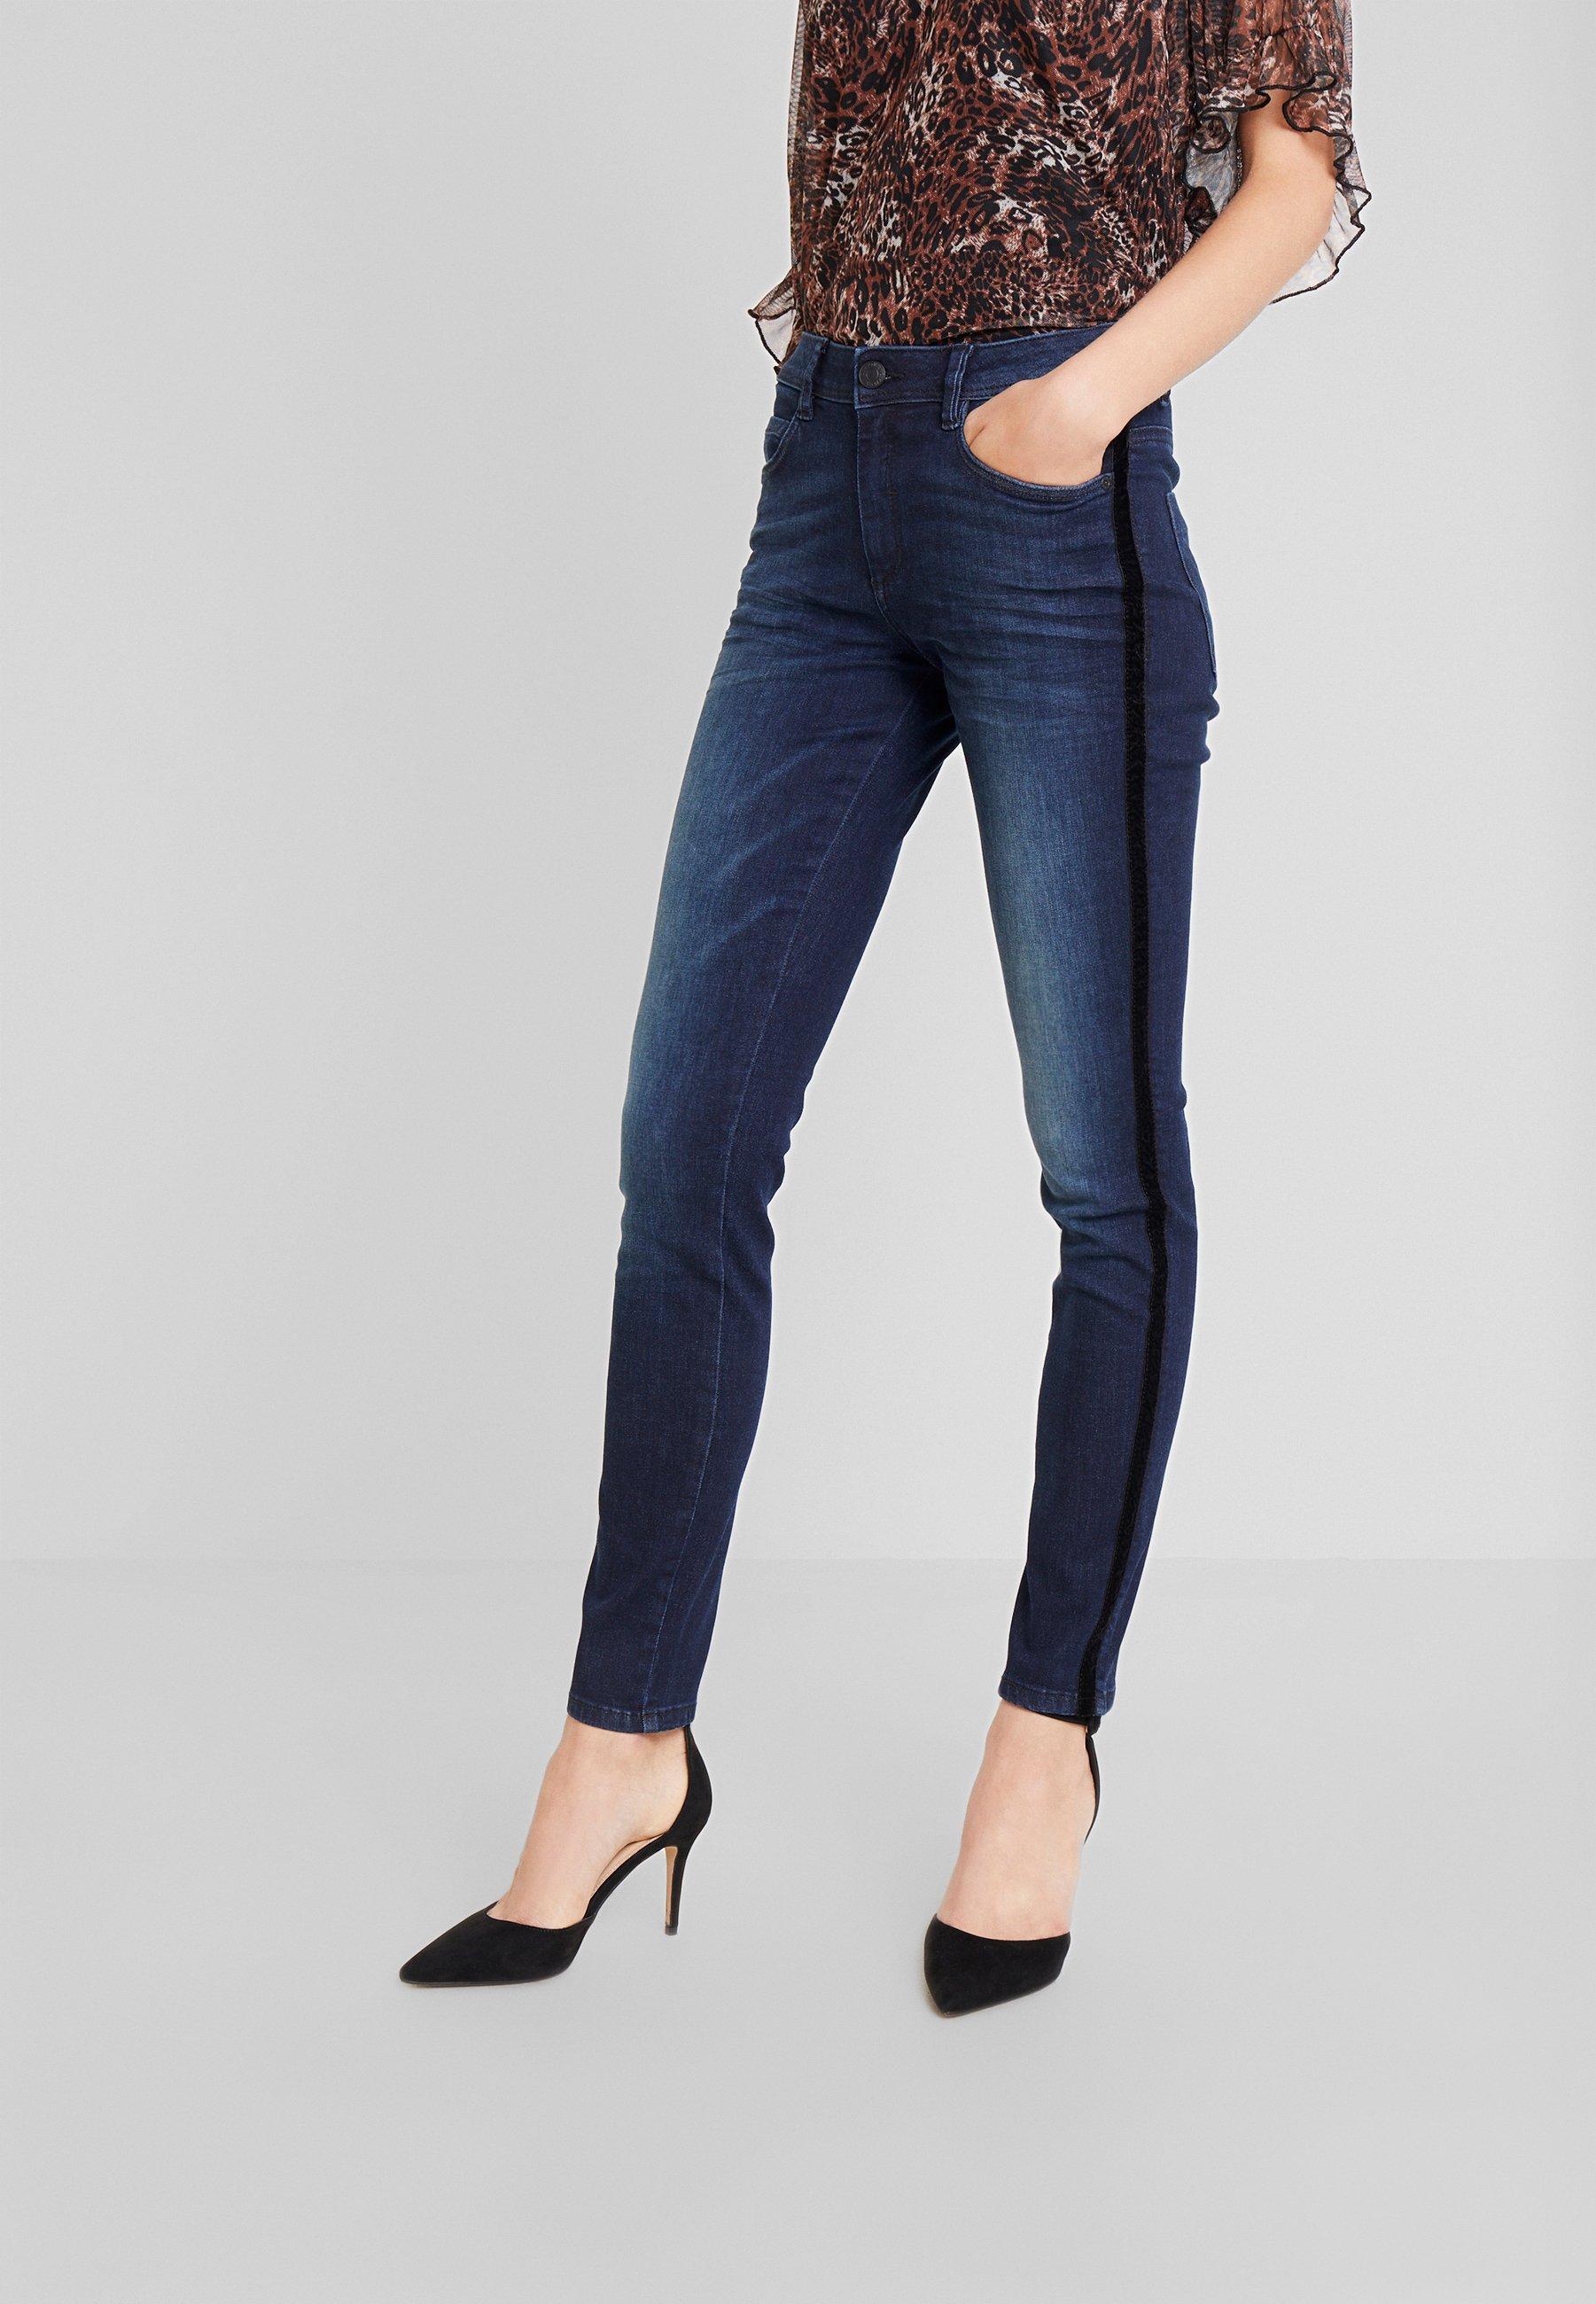 blue Tailor KateJeans Denim Dark Stone Tom Skinny Wash dexBCorW